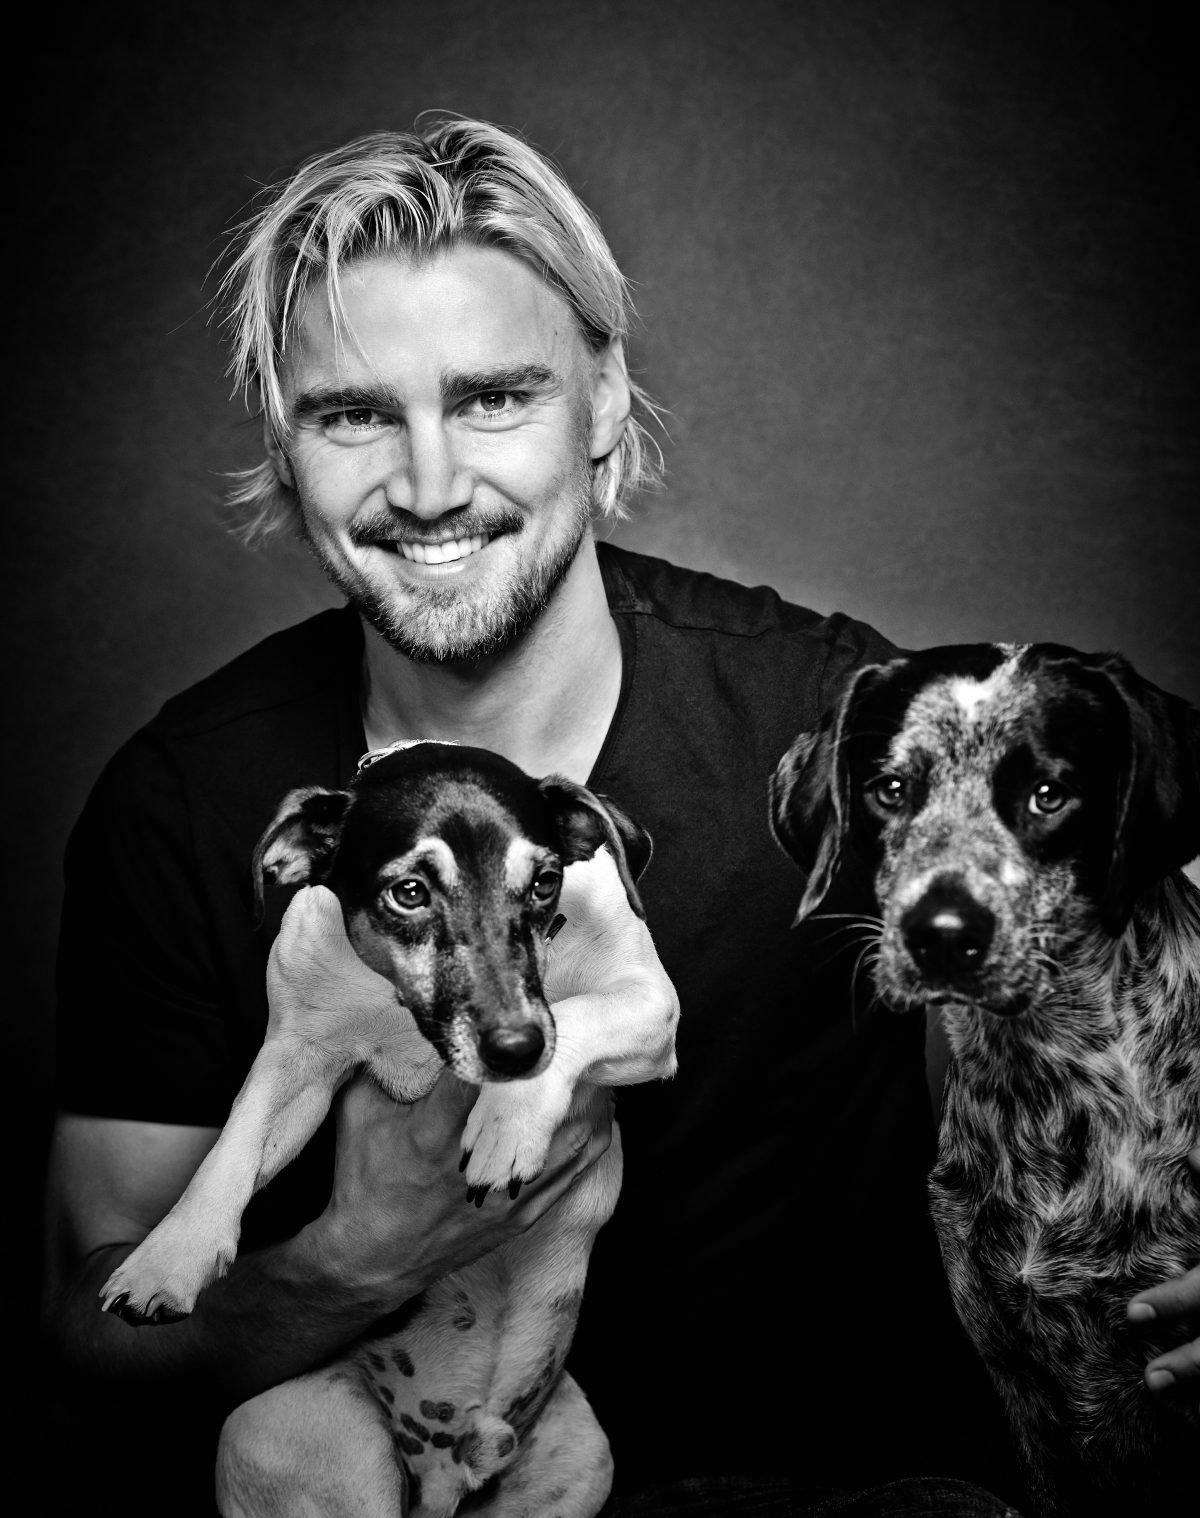 marcel-schmelzer-fuer-mein-charity-buch-prominent-mit-hund-foto-nikolaj-georgiew-www.ciaogianna.de